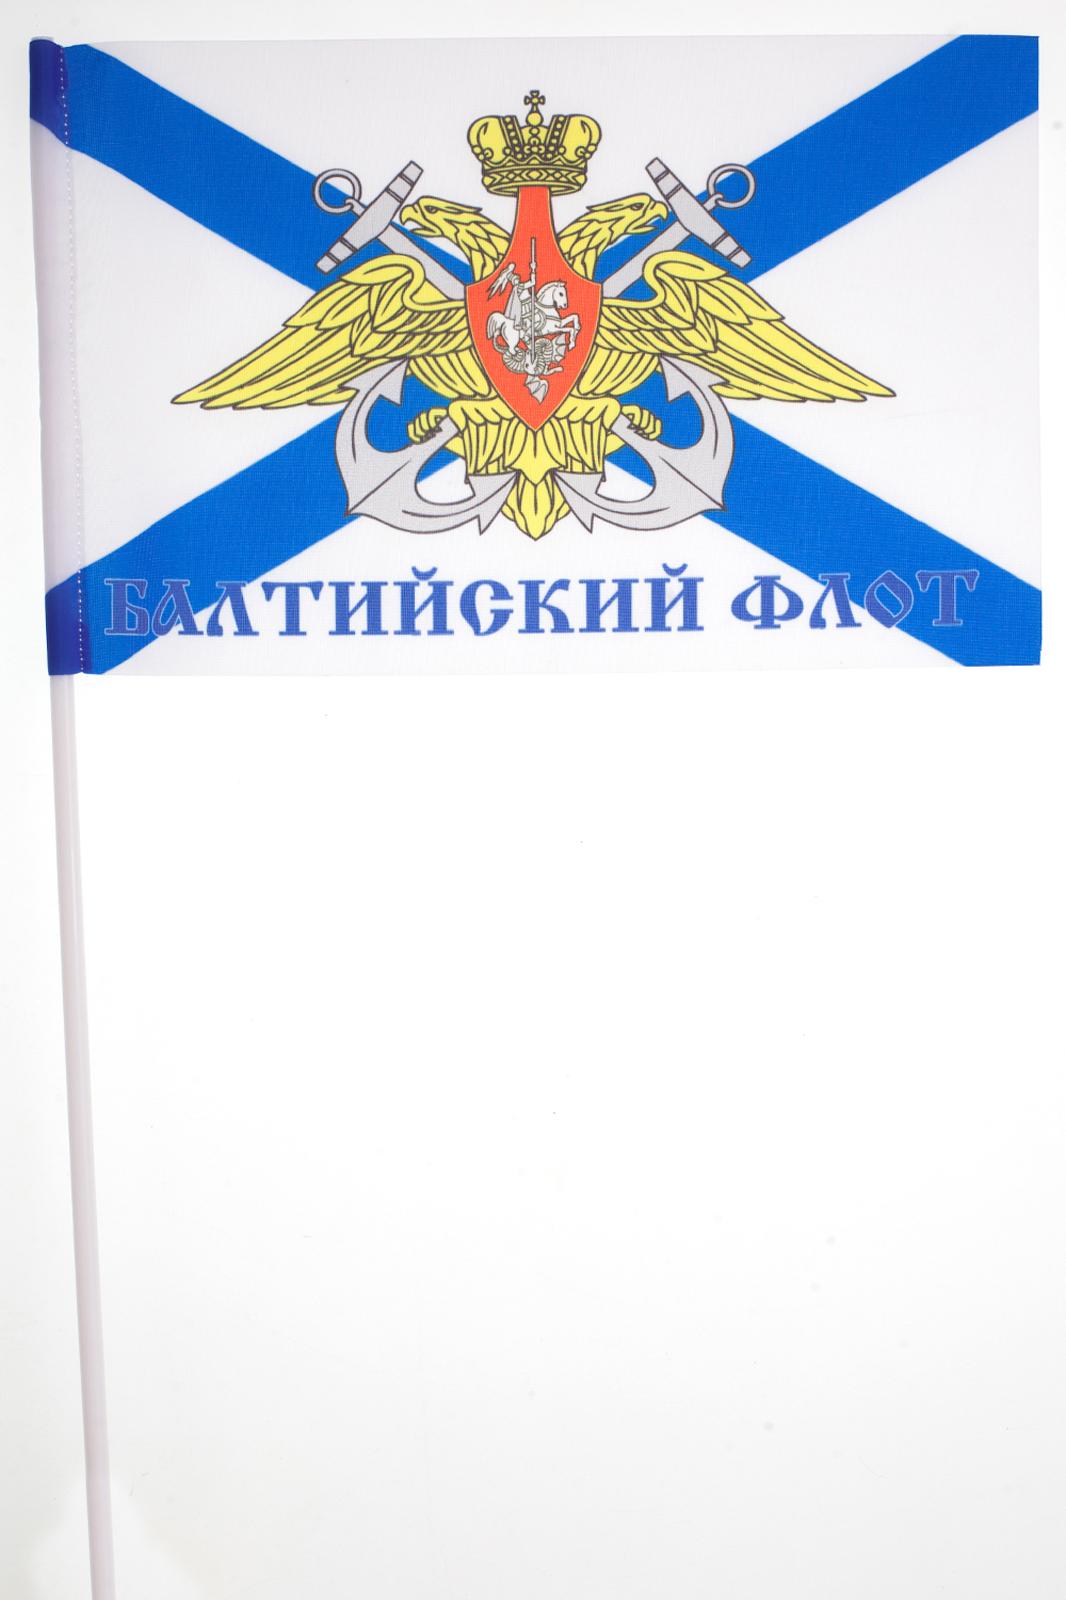 Купить флажок на палочке «Балтийский флот»